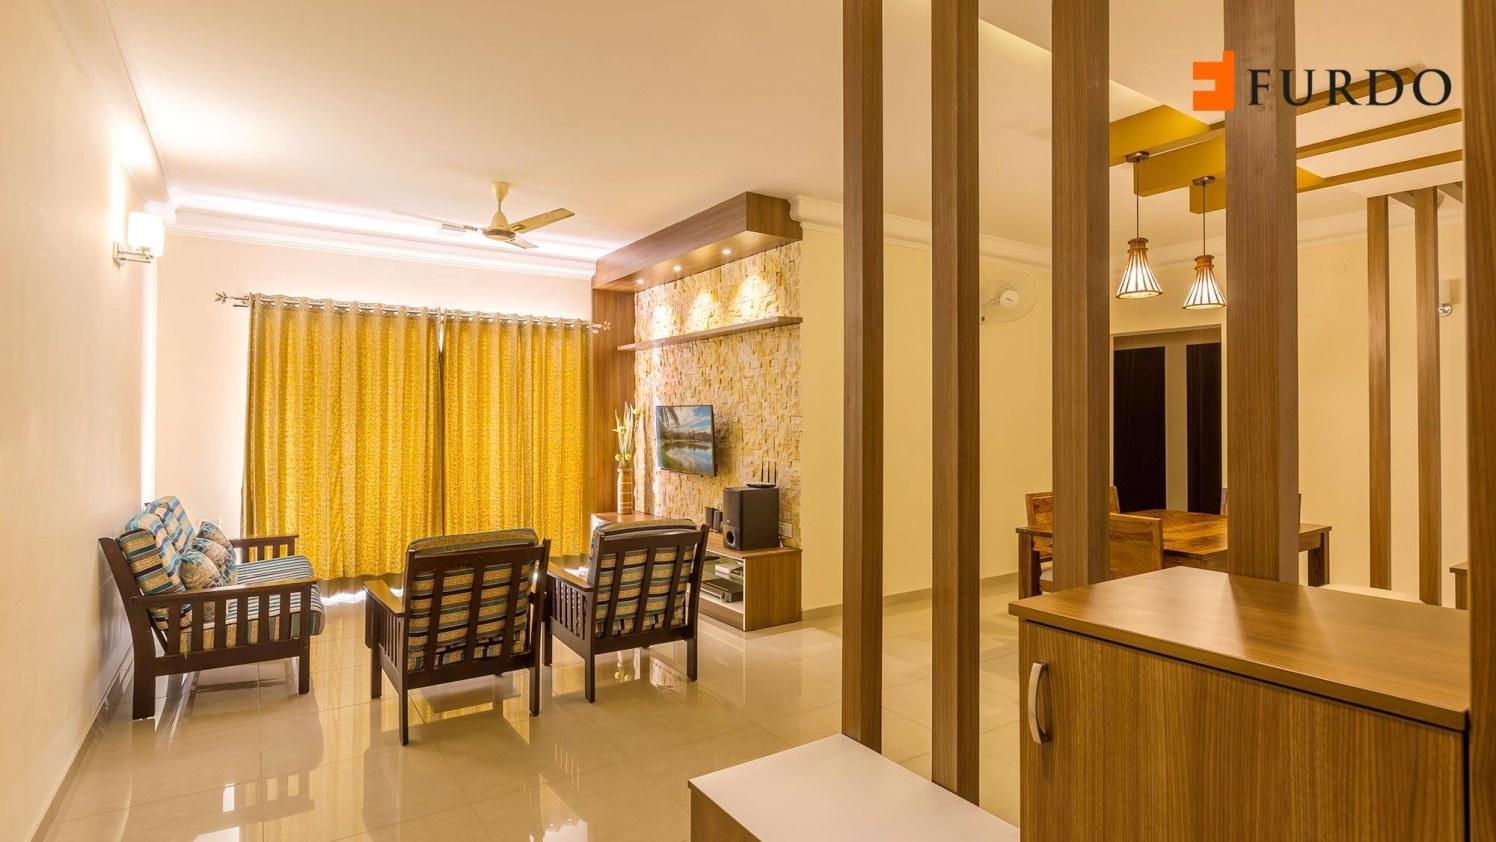 Living Room With Yellow Curtains And White Ceiling by Furdo.com Living-room Contemporary | Interior Design Photos & Ideas